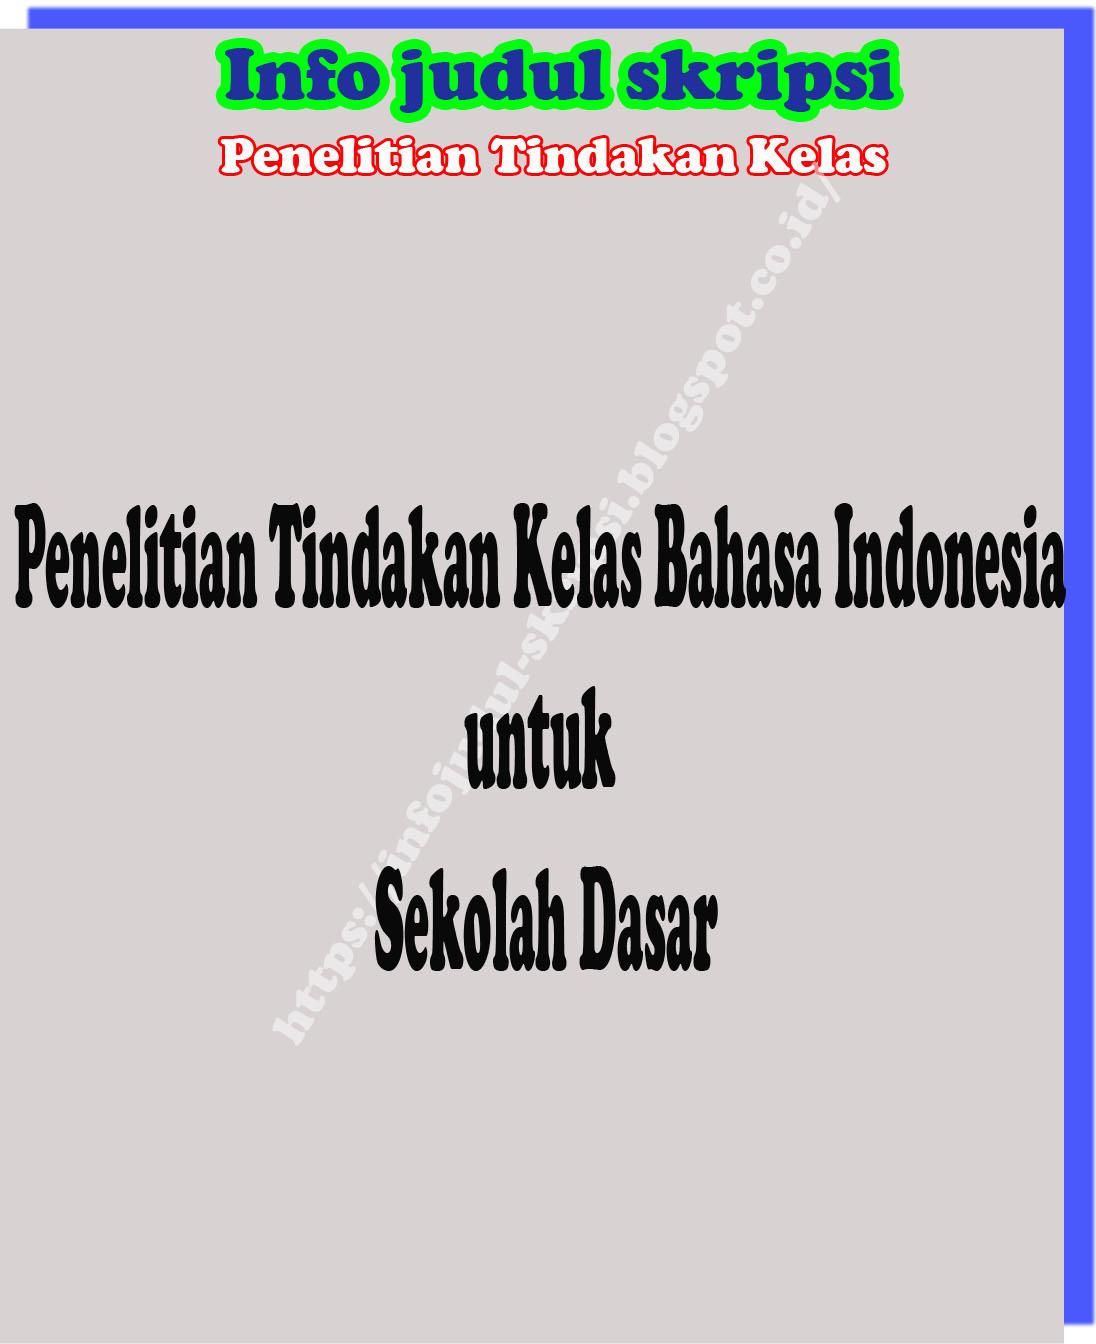 Contoh Judul Skripsi Ptk Bahasa Indonesia - Kumpulan ...